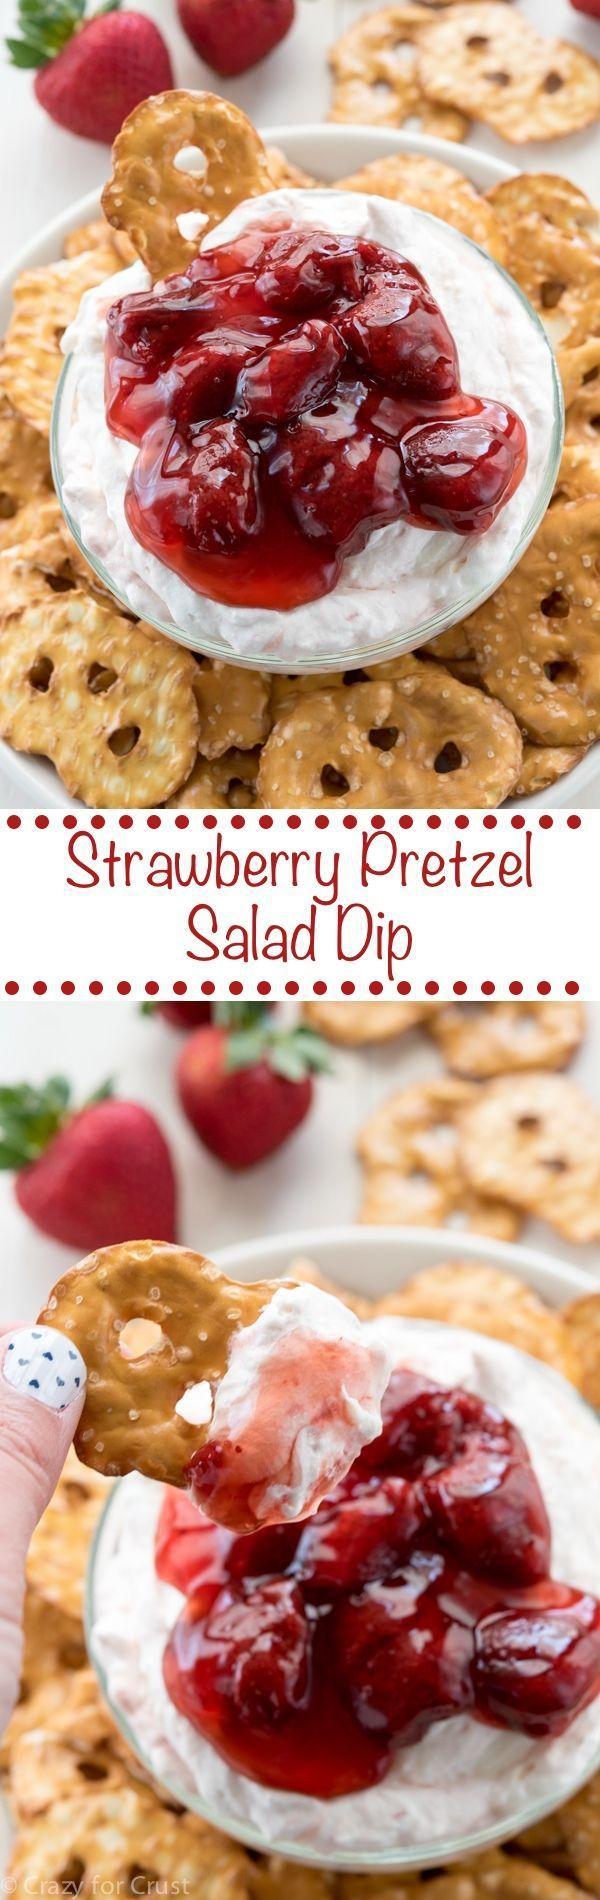 Erdbeer-Brezel-Salat-Dip   – Appetizer Recipes + Snack Ideas